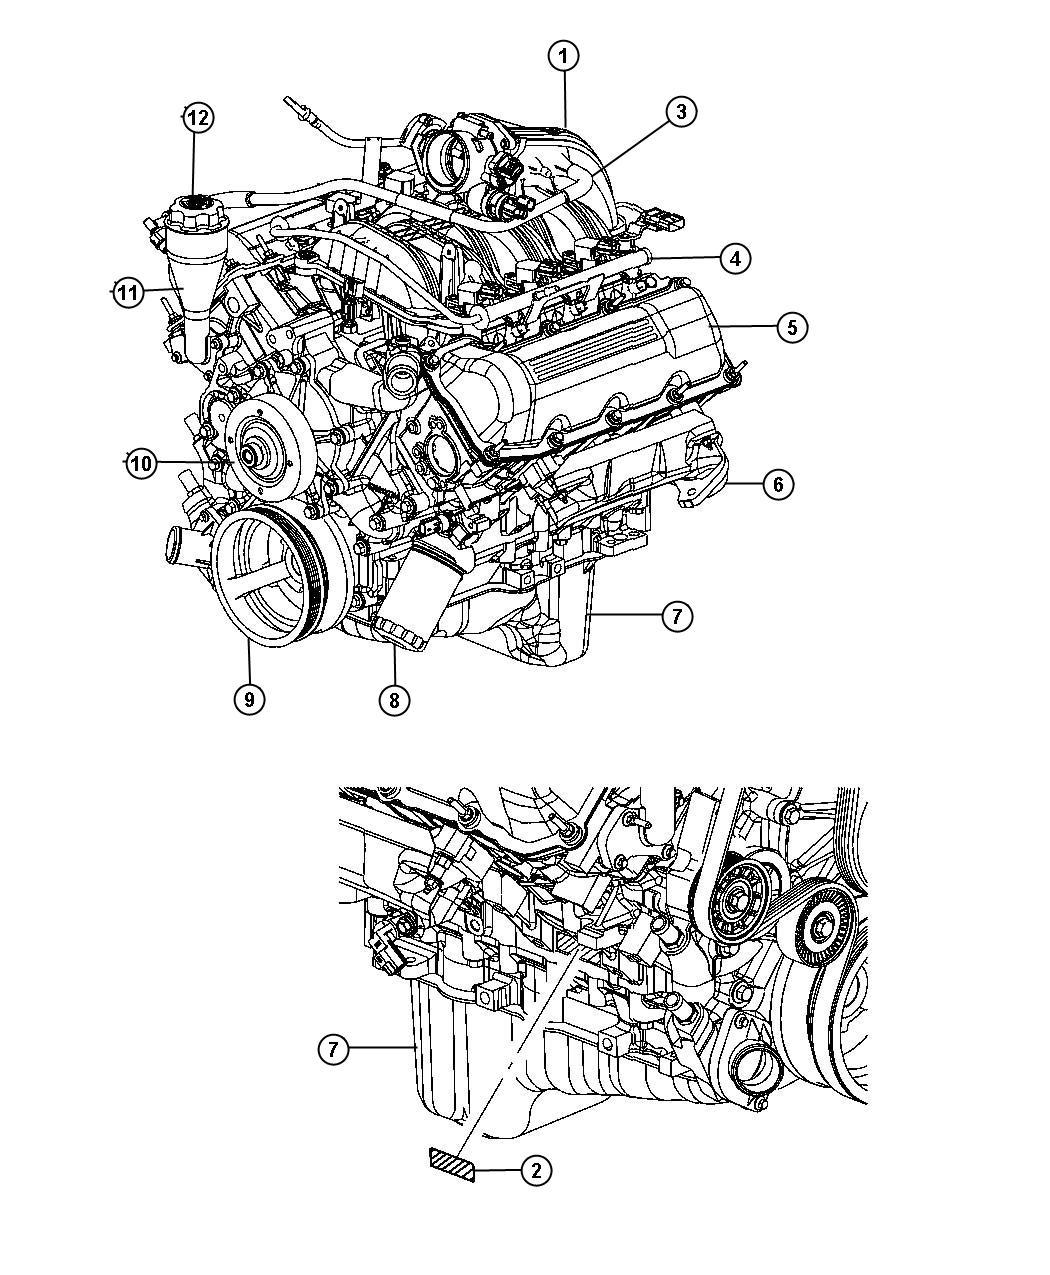 DIAGRAM] 2 7l Dodge Engine Diagram FULL Version HD Quality Engine Diagram -  VENNDIAGRAMONLINE.NUITDEBOUTAIX.FRvenndiagramonline.nuitdeboutaix.fr